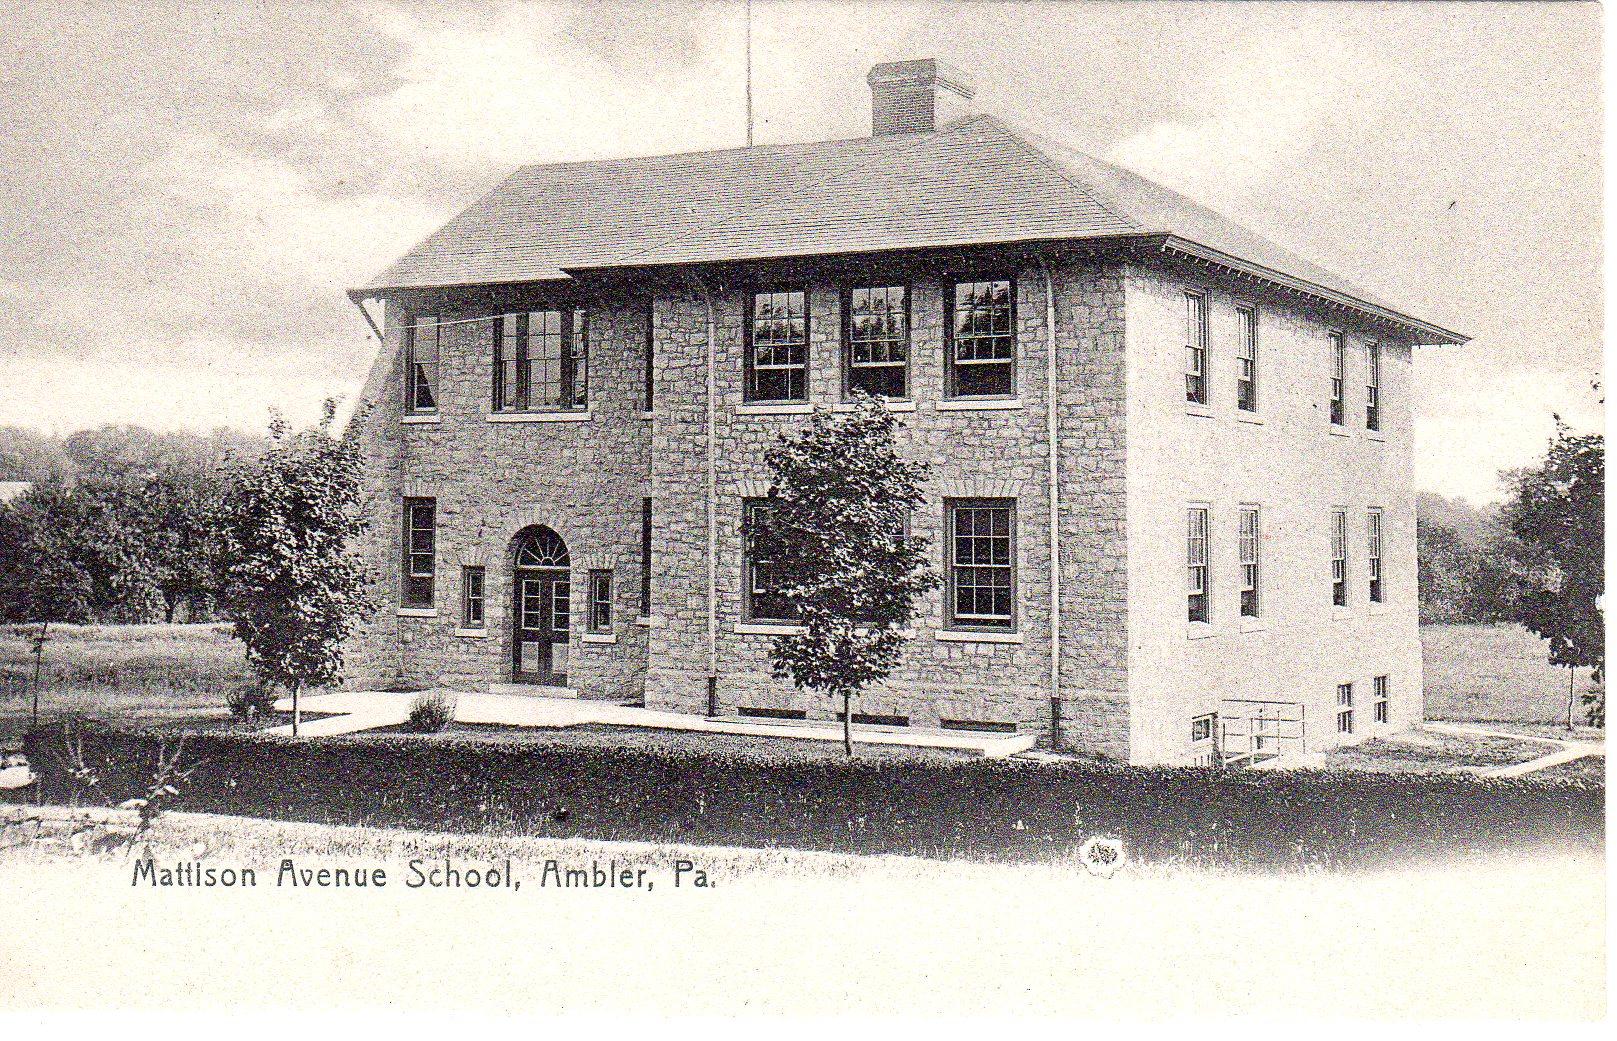 Post Card Collection (E Simon)_2682_87_Mattison Ave School, Ambler, Pa